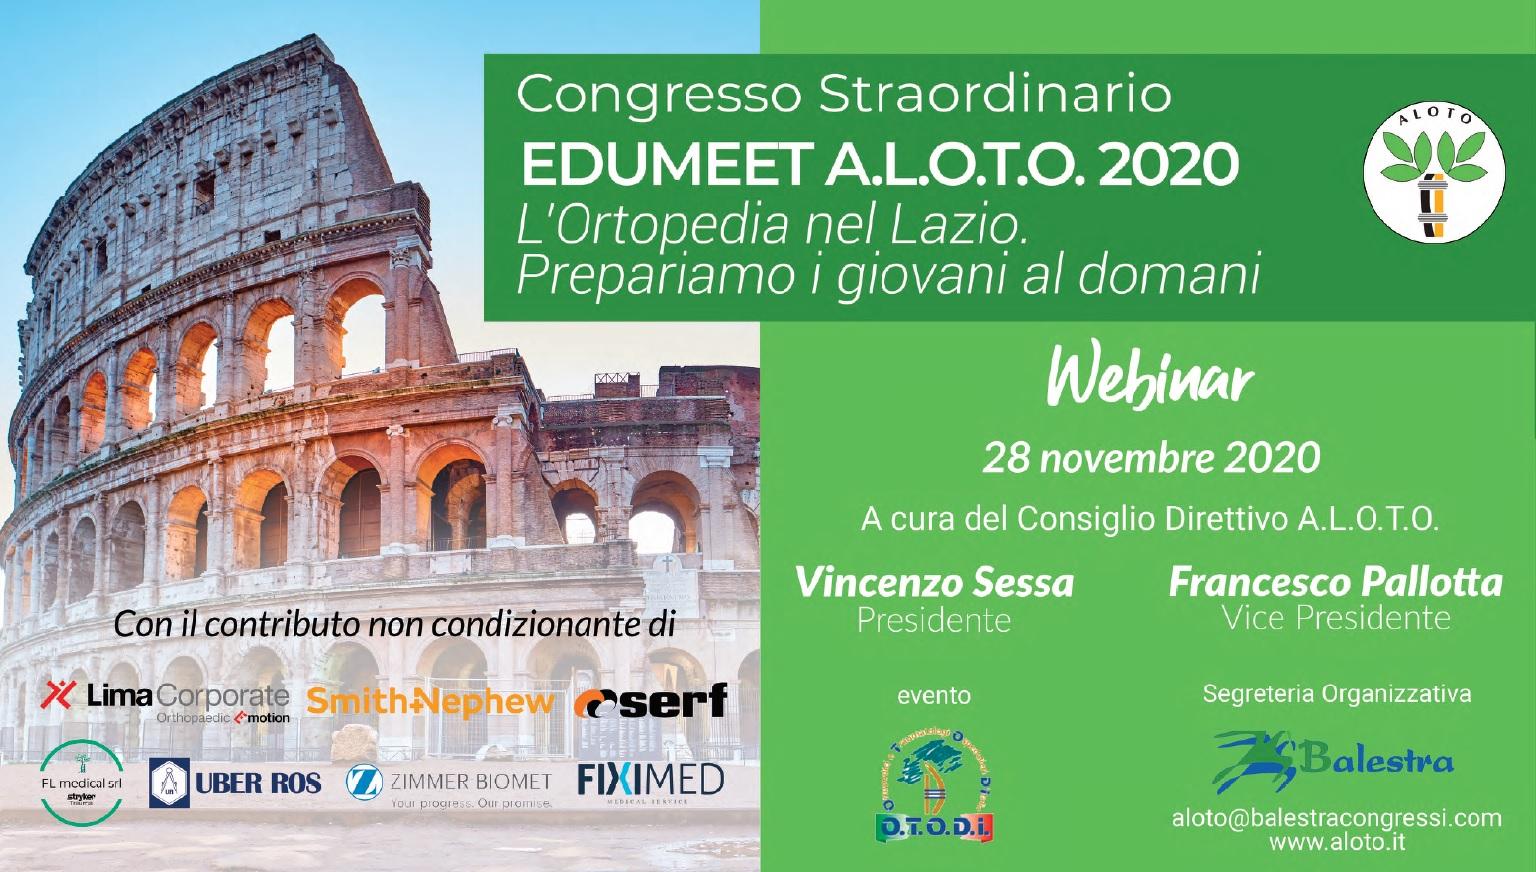 28 NOV | Congresso Straordinario EDUMEET A.L.O.TO. 2020